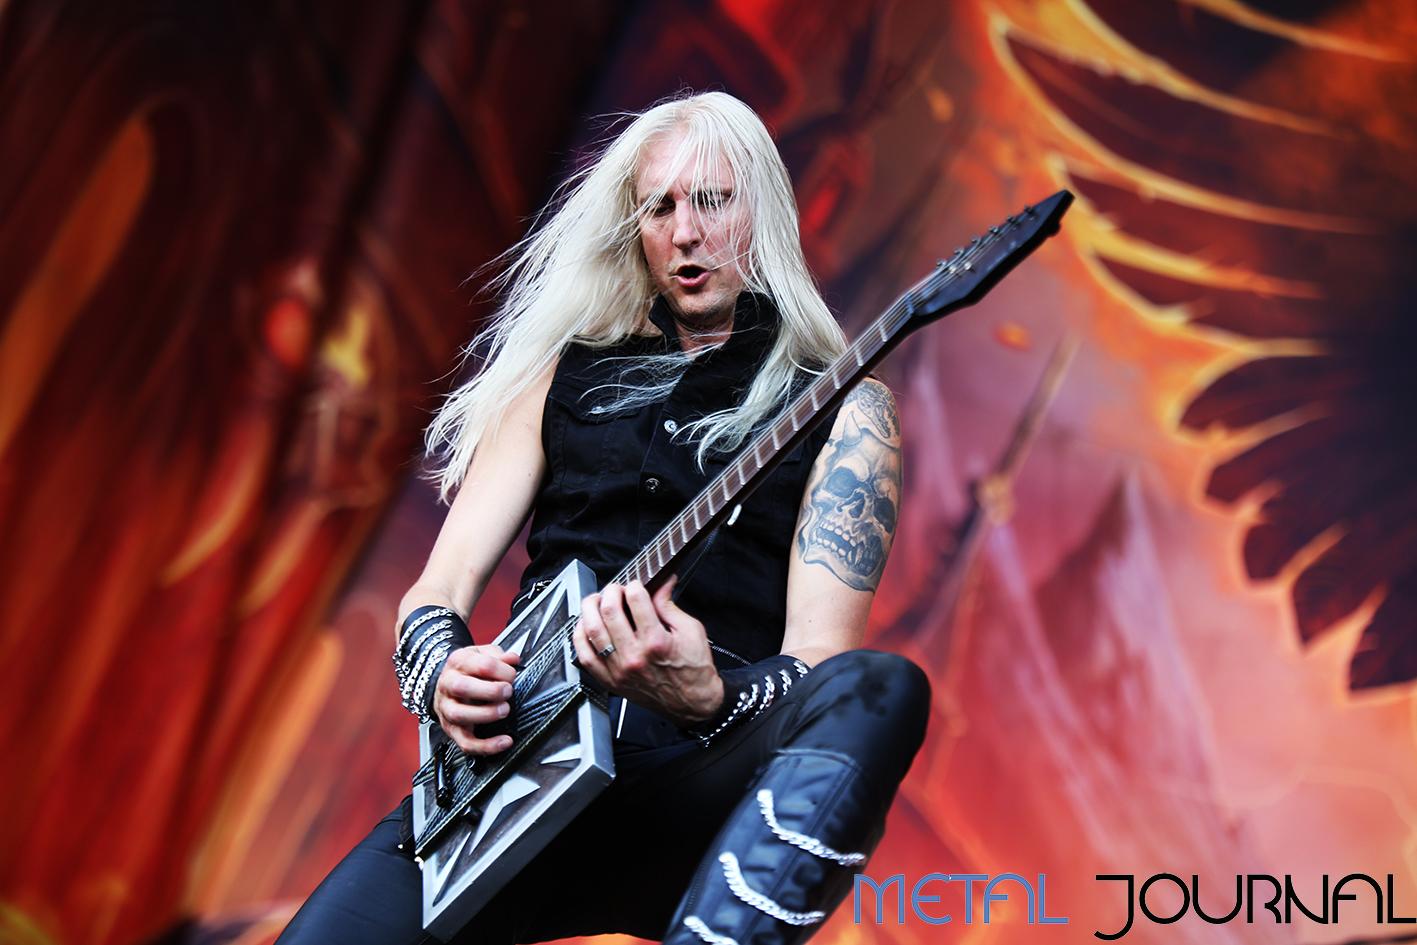 hammerfall - leyendas del rock 2019 metal journal pic 2